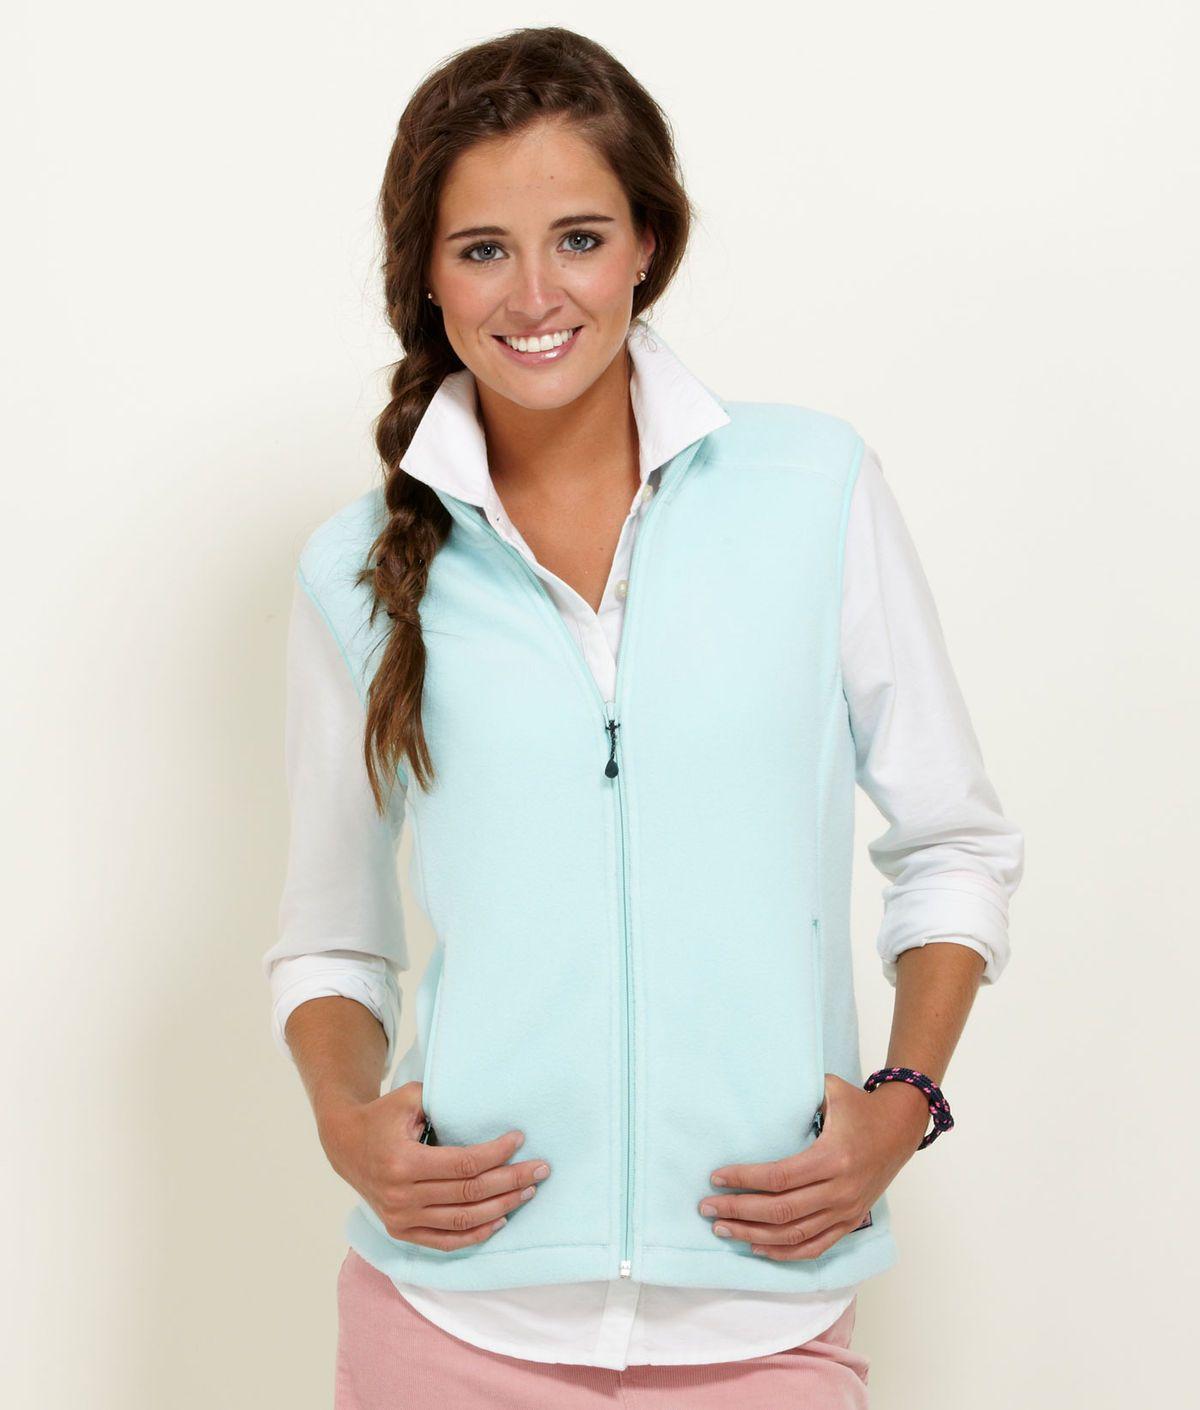 Vv fleece westerly vest for the closet pinterest clothes